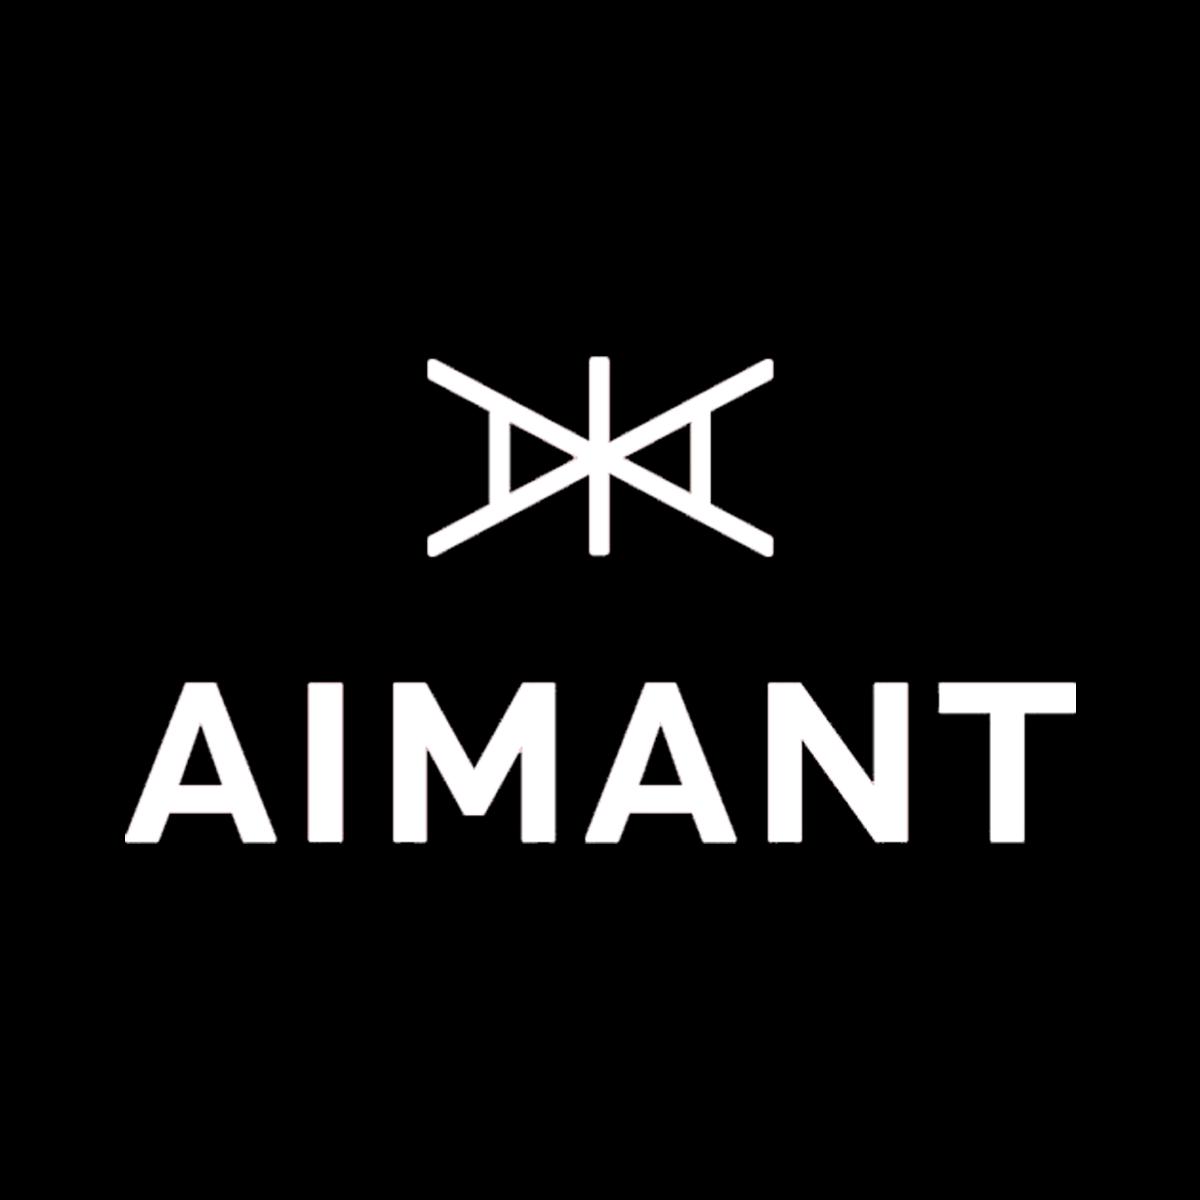 aimant